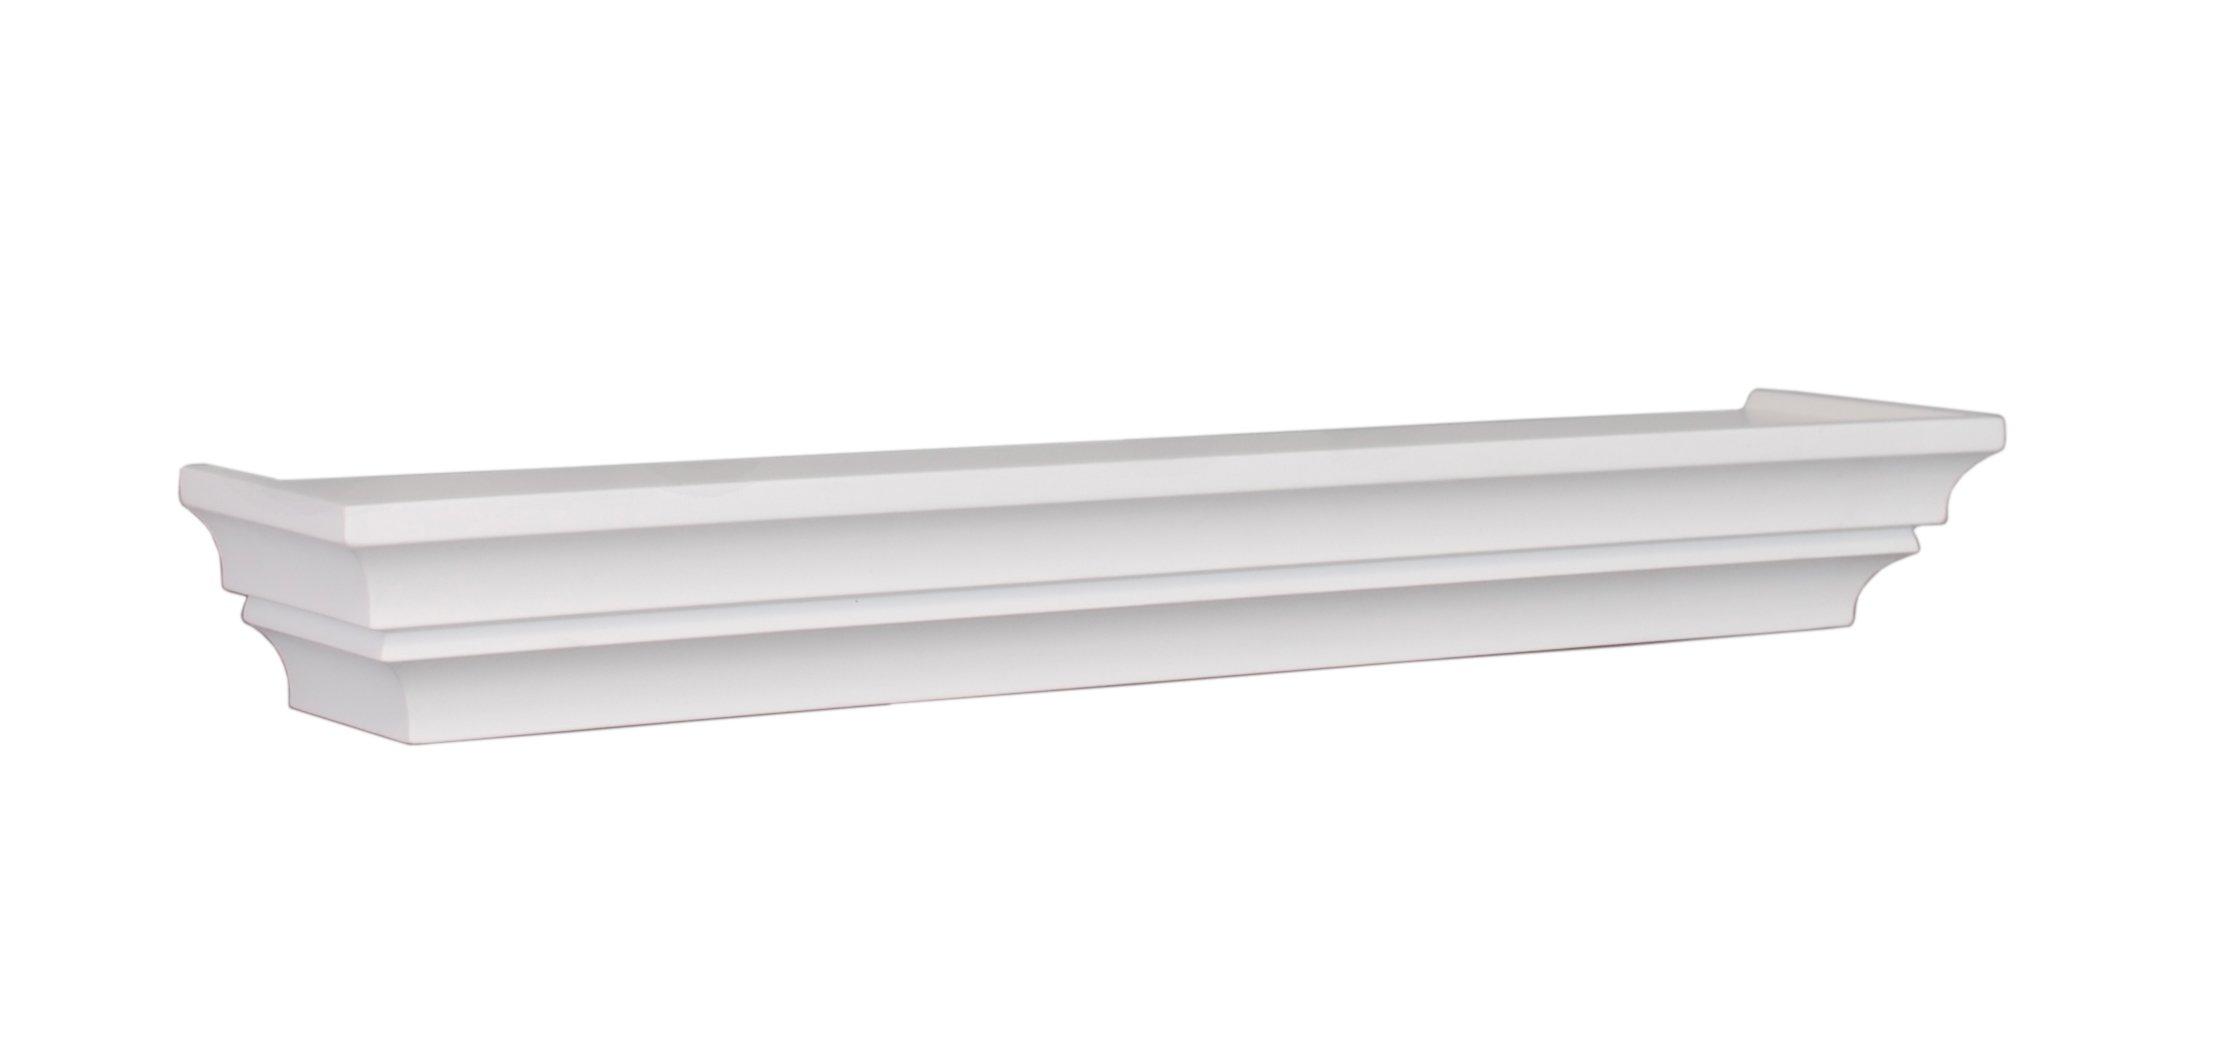 nexxt madison contoured wall ledge shelf 24 inch white. Black Bedroom Furniture Sets. Home Design Ideas